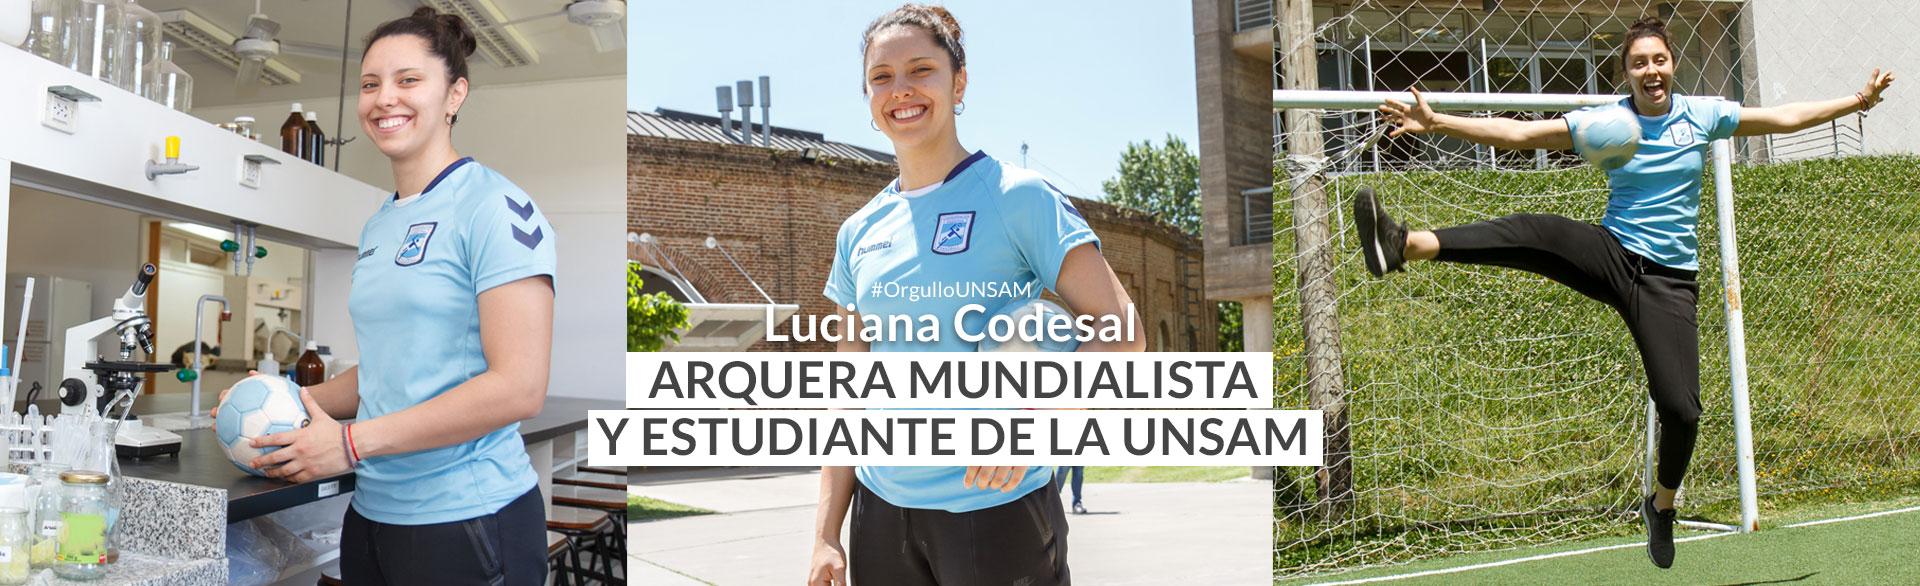 Luciana Codesal, arquera mundialista